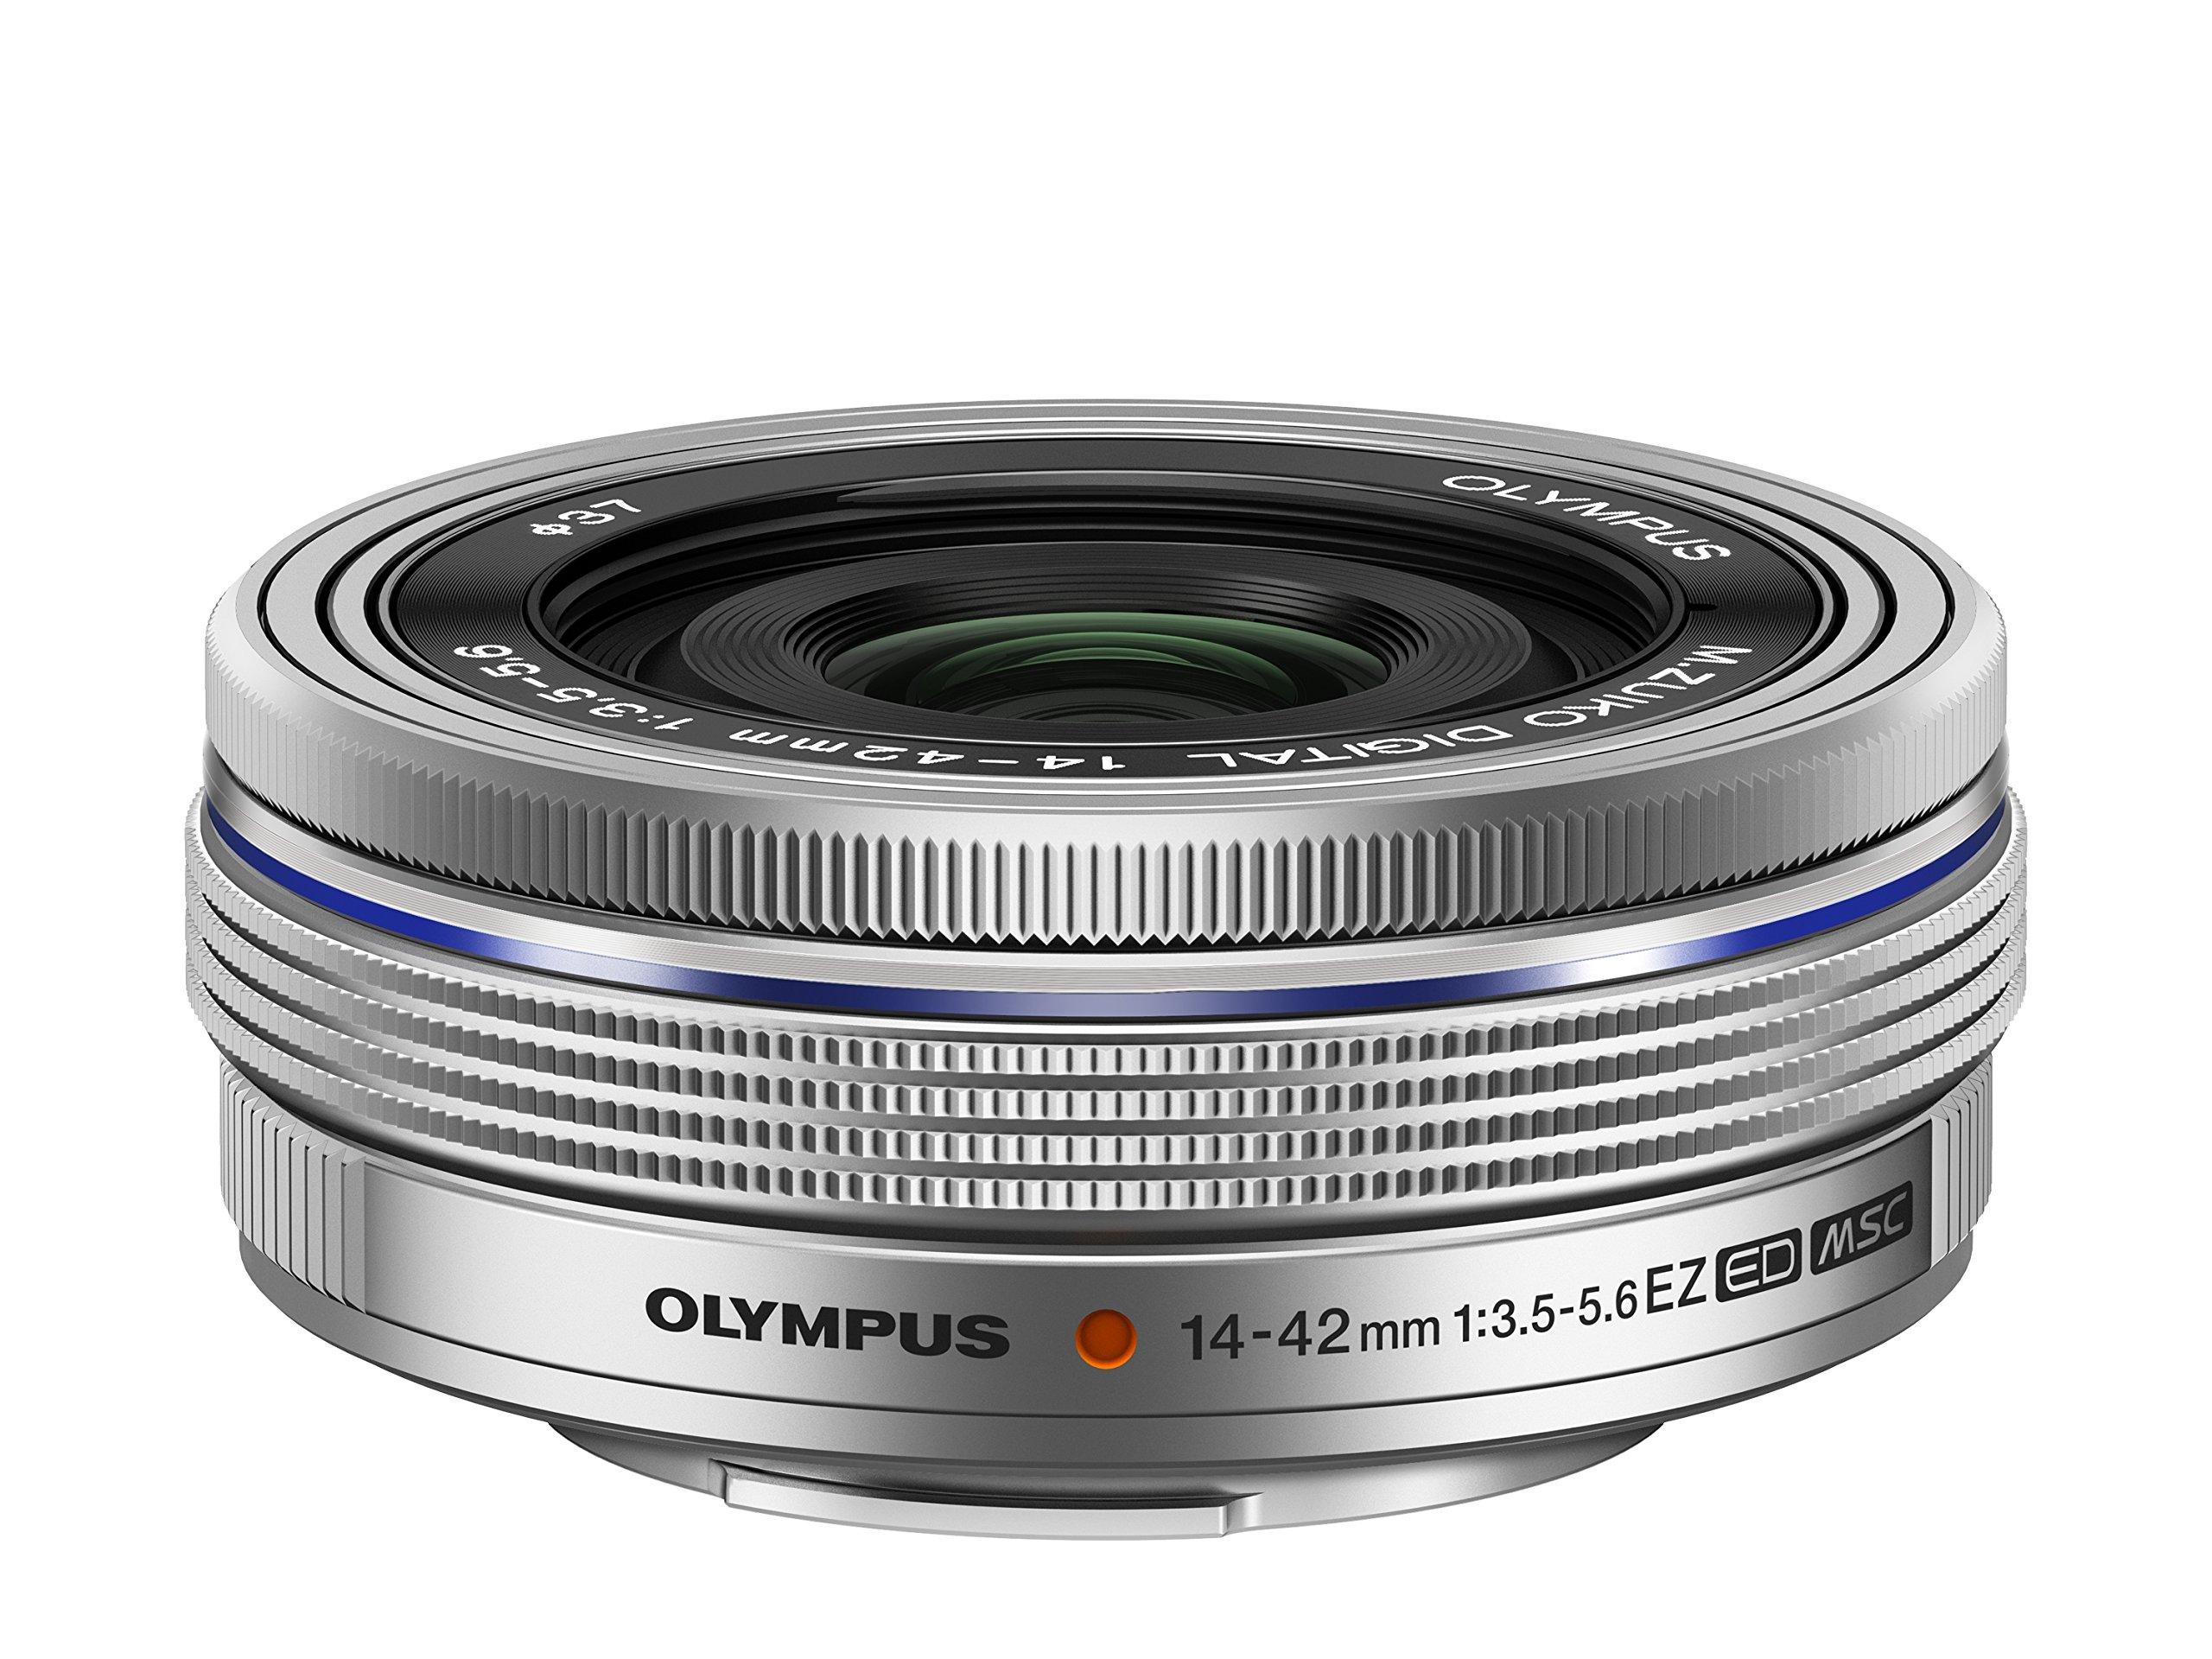 Olympus 14-42mm f3.5-5.6 EZ Interchangeable Lens for Olympus/Panasonic Micro 4/3 Digital Camera (Silver)  - International Version (No Warranty)